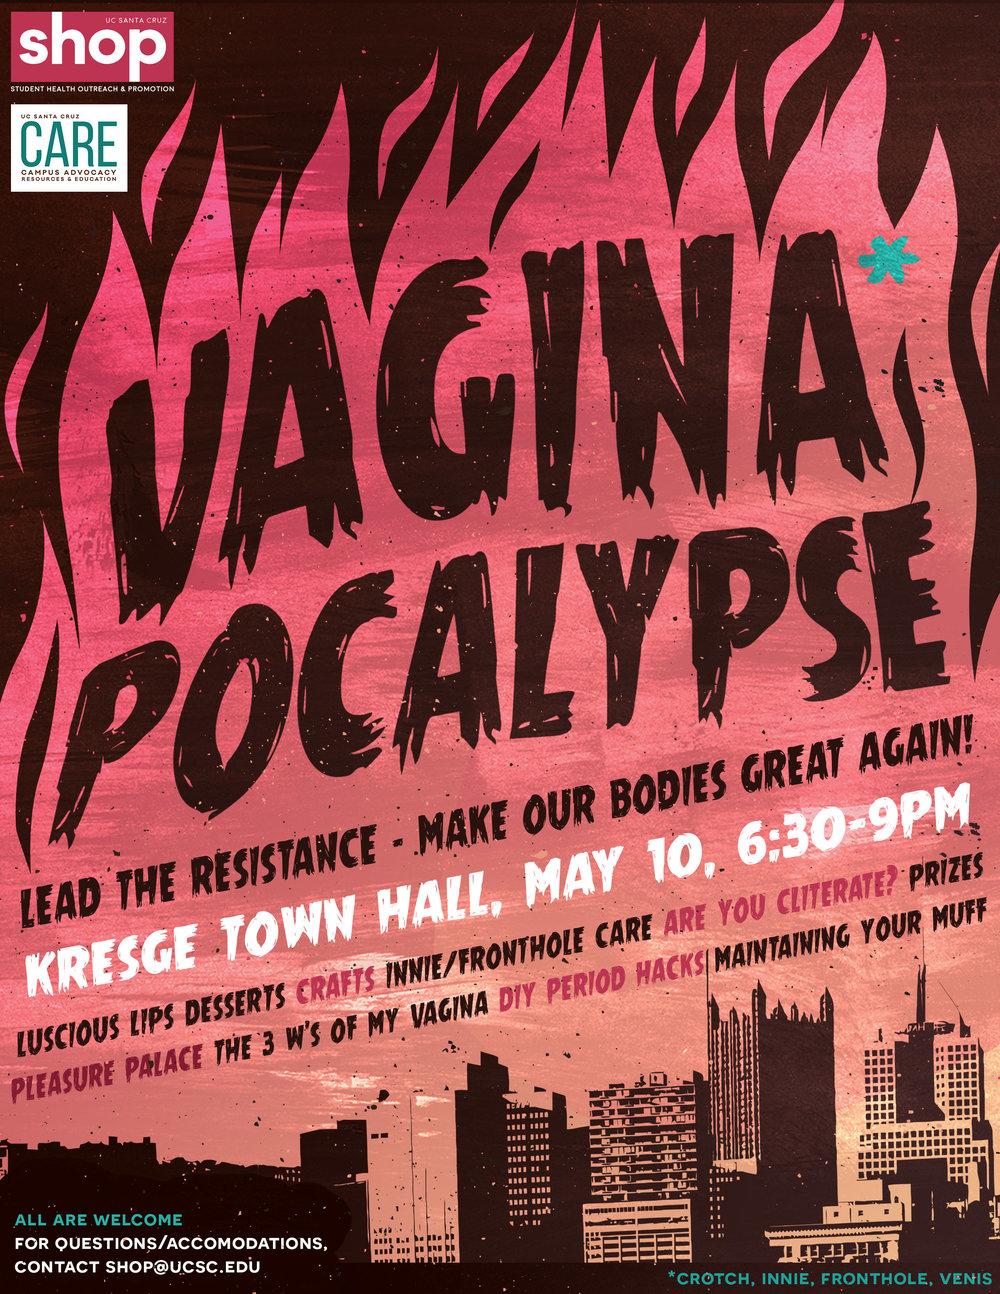 Vaginapocalypse2.jpg